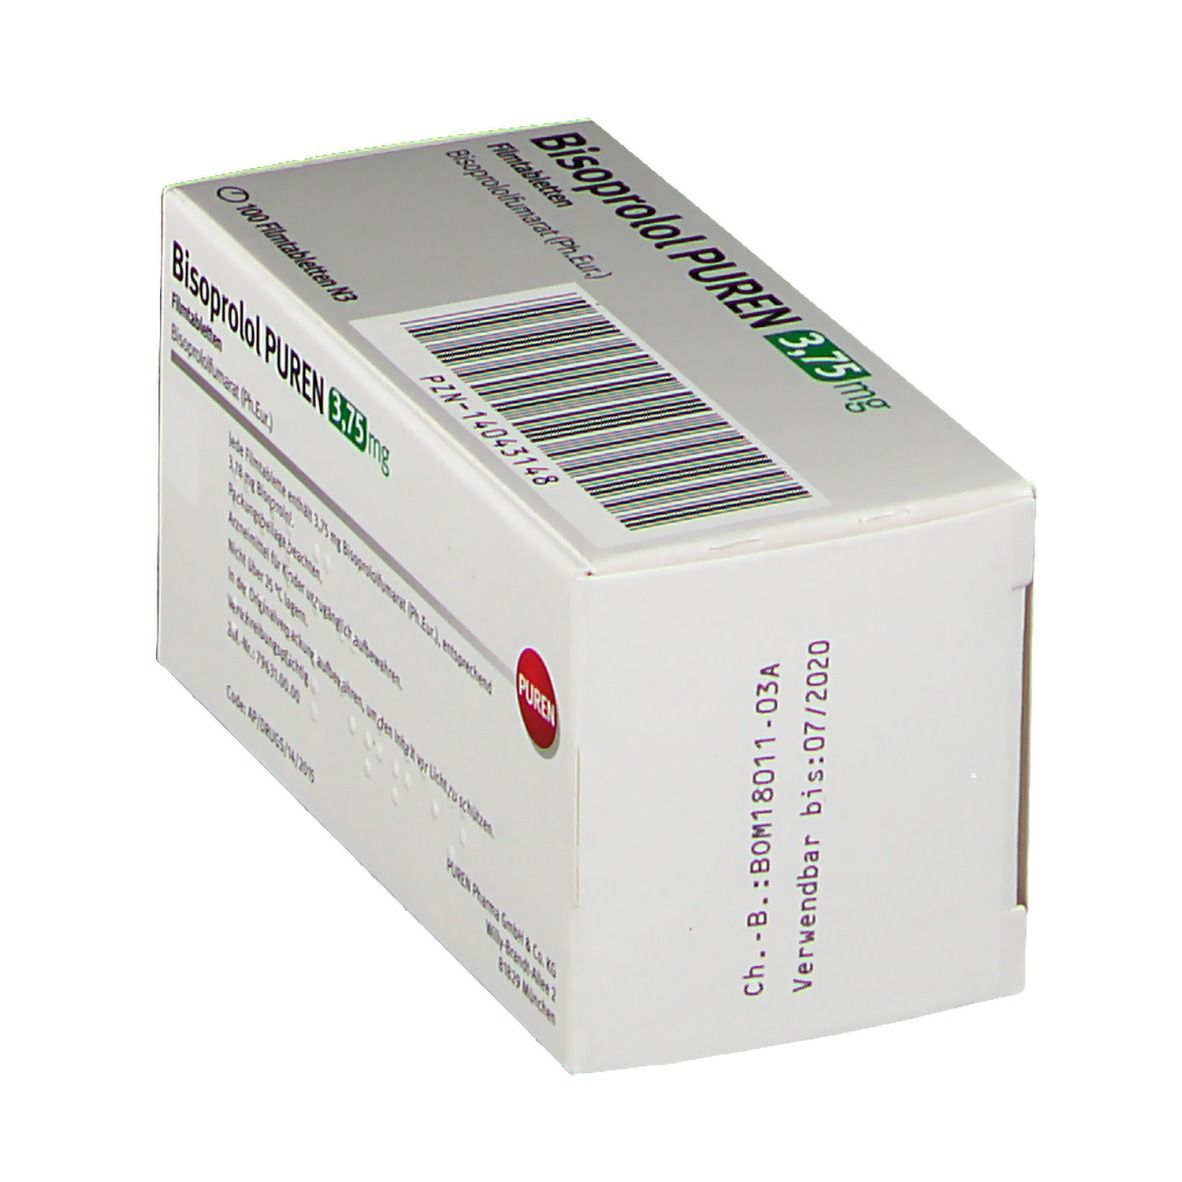 BISOPROLOL PUREN 3,75 mg Filmtabletten